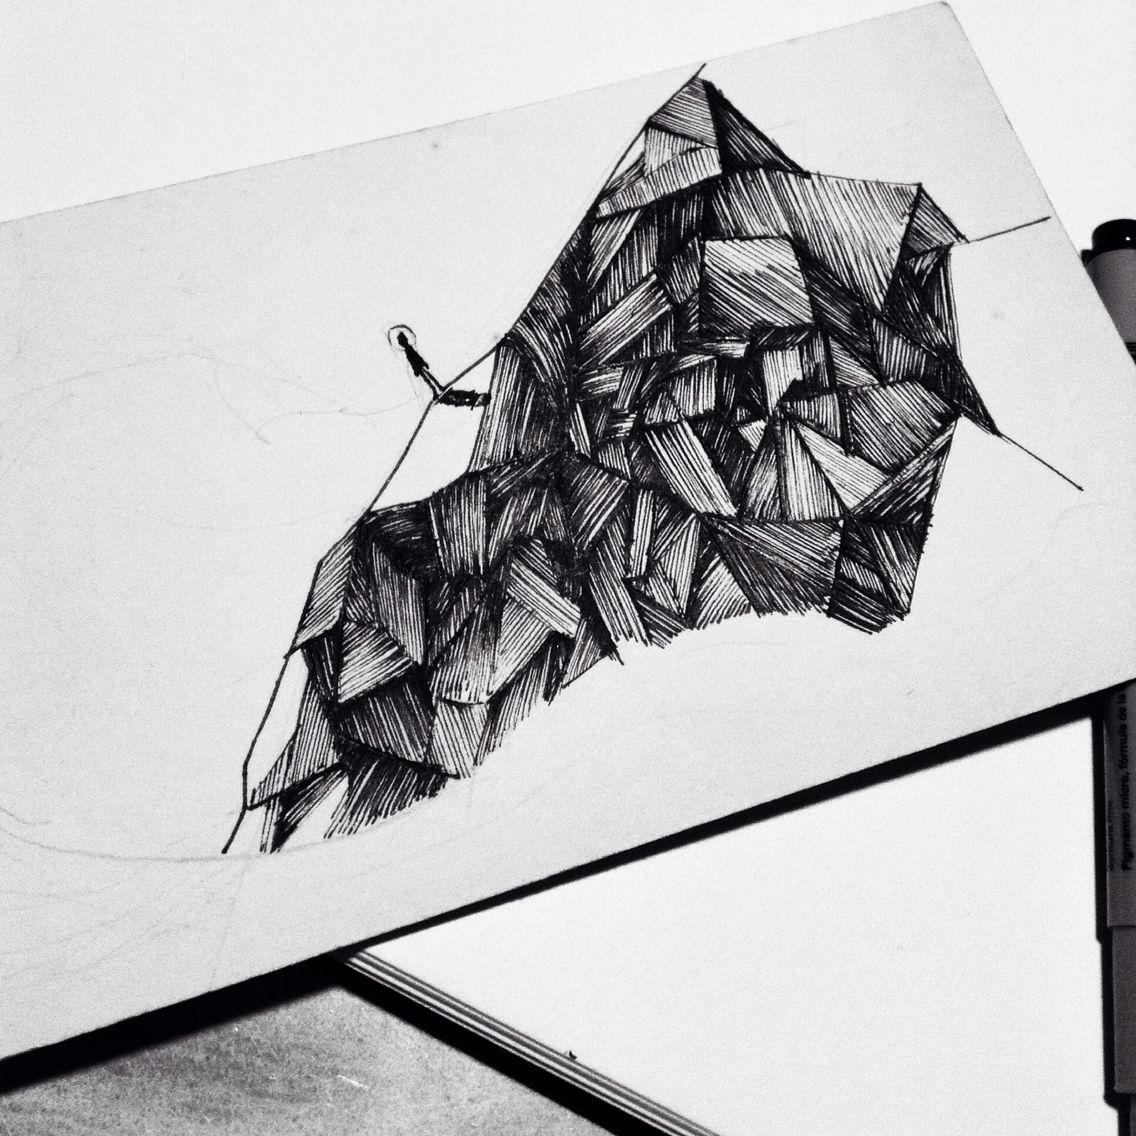 work in progress photo cross hatching pen ink sketch fish and